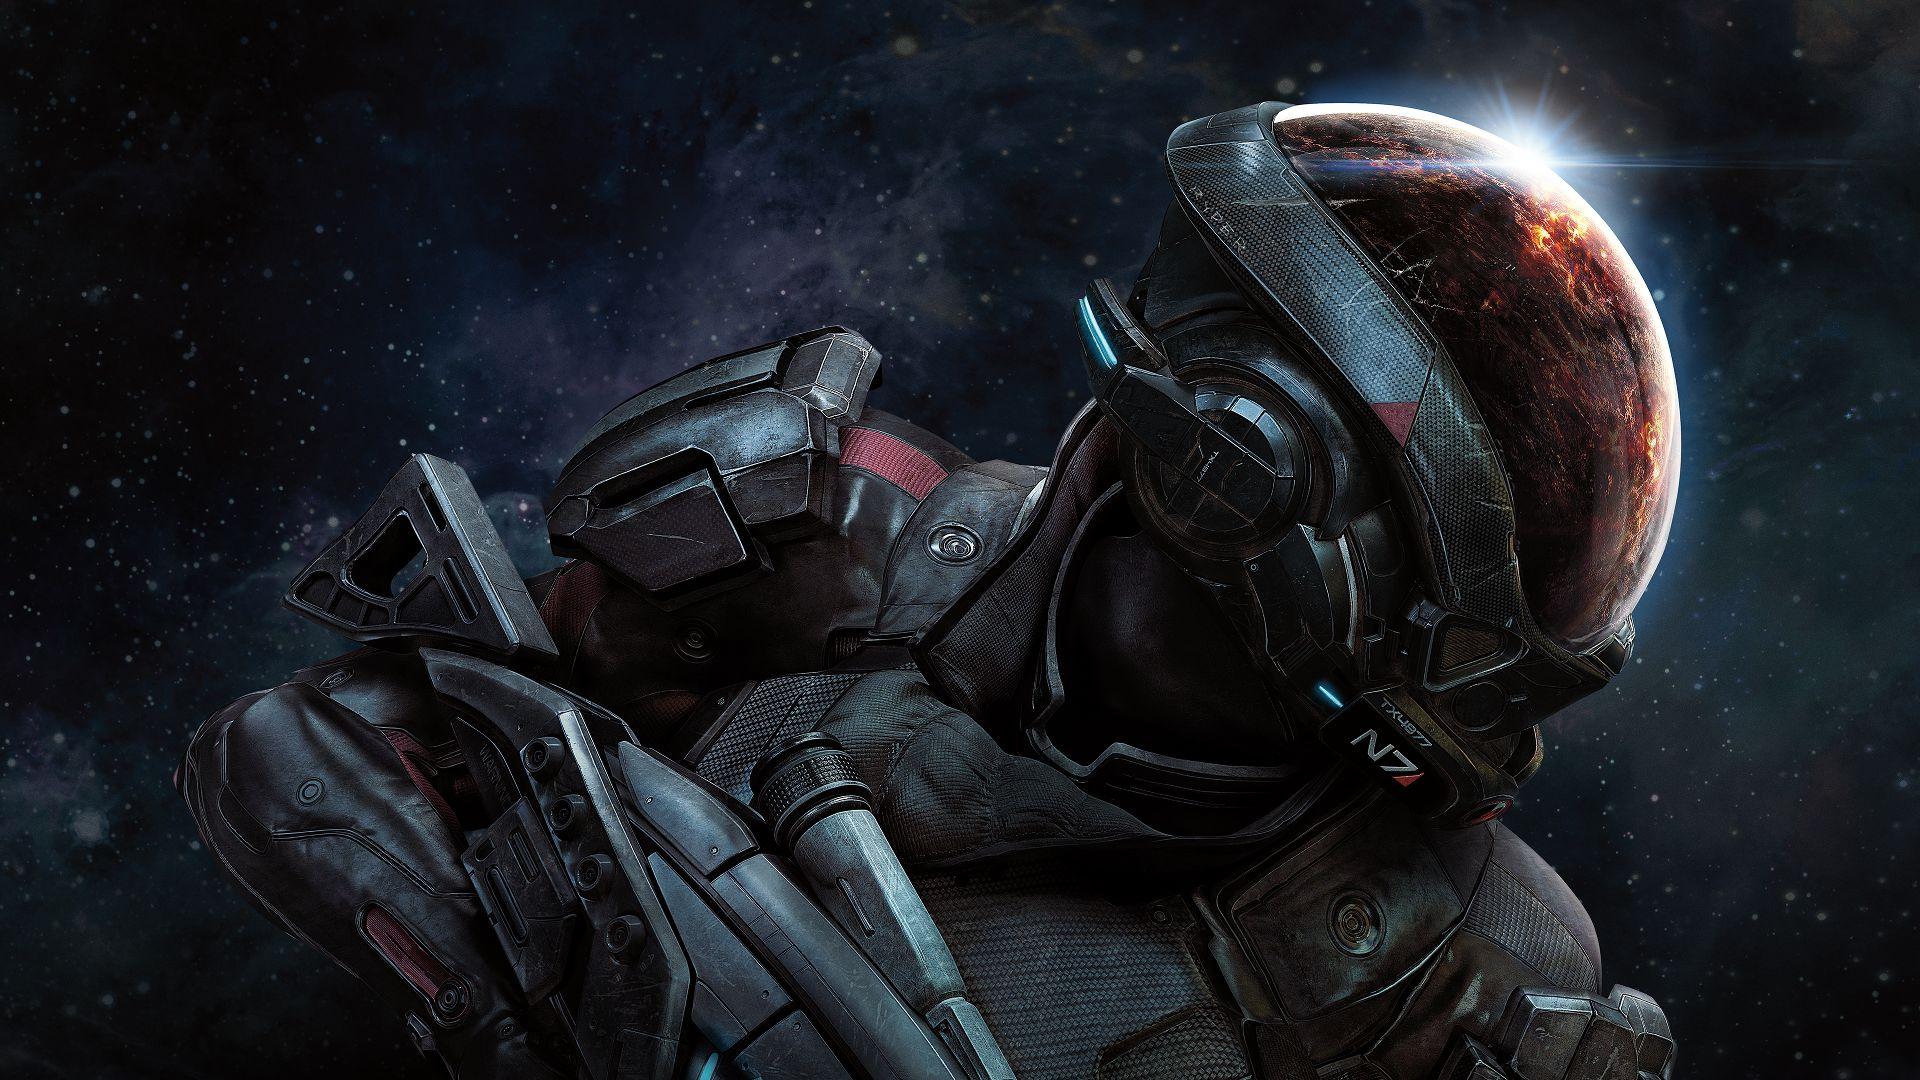 En marzo llega Mass Effect: Andromeda